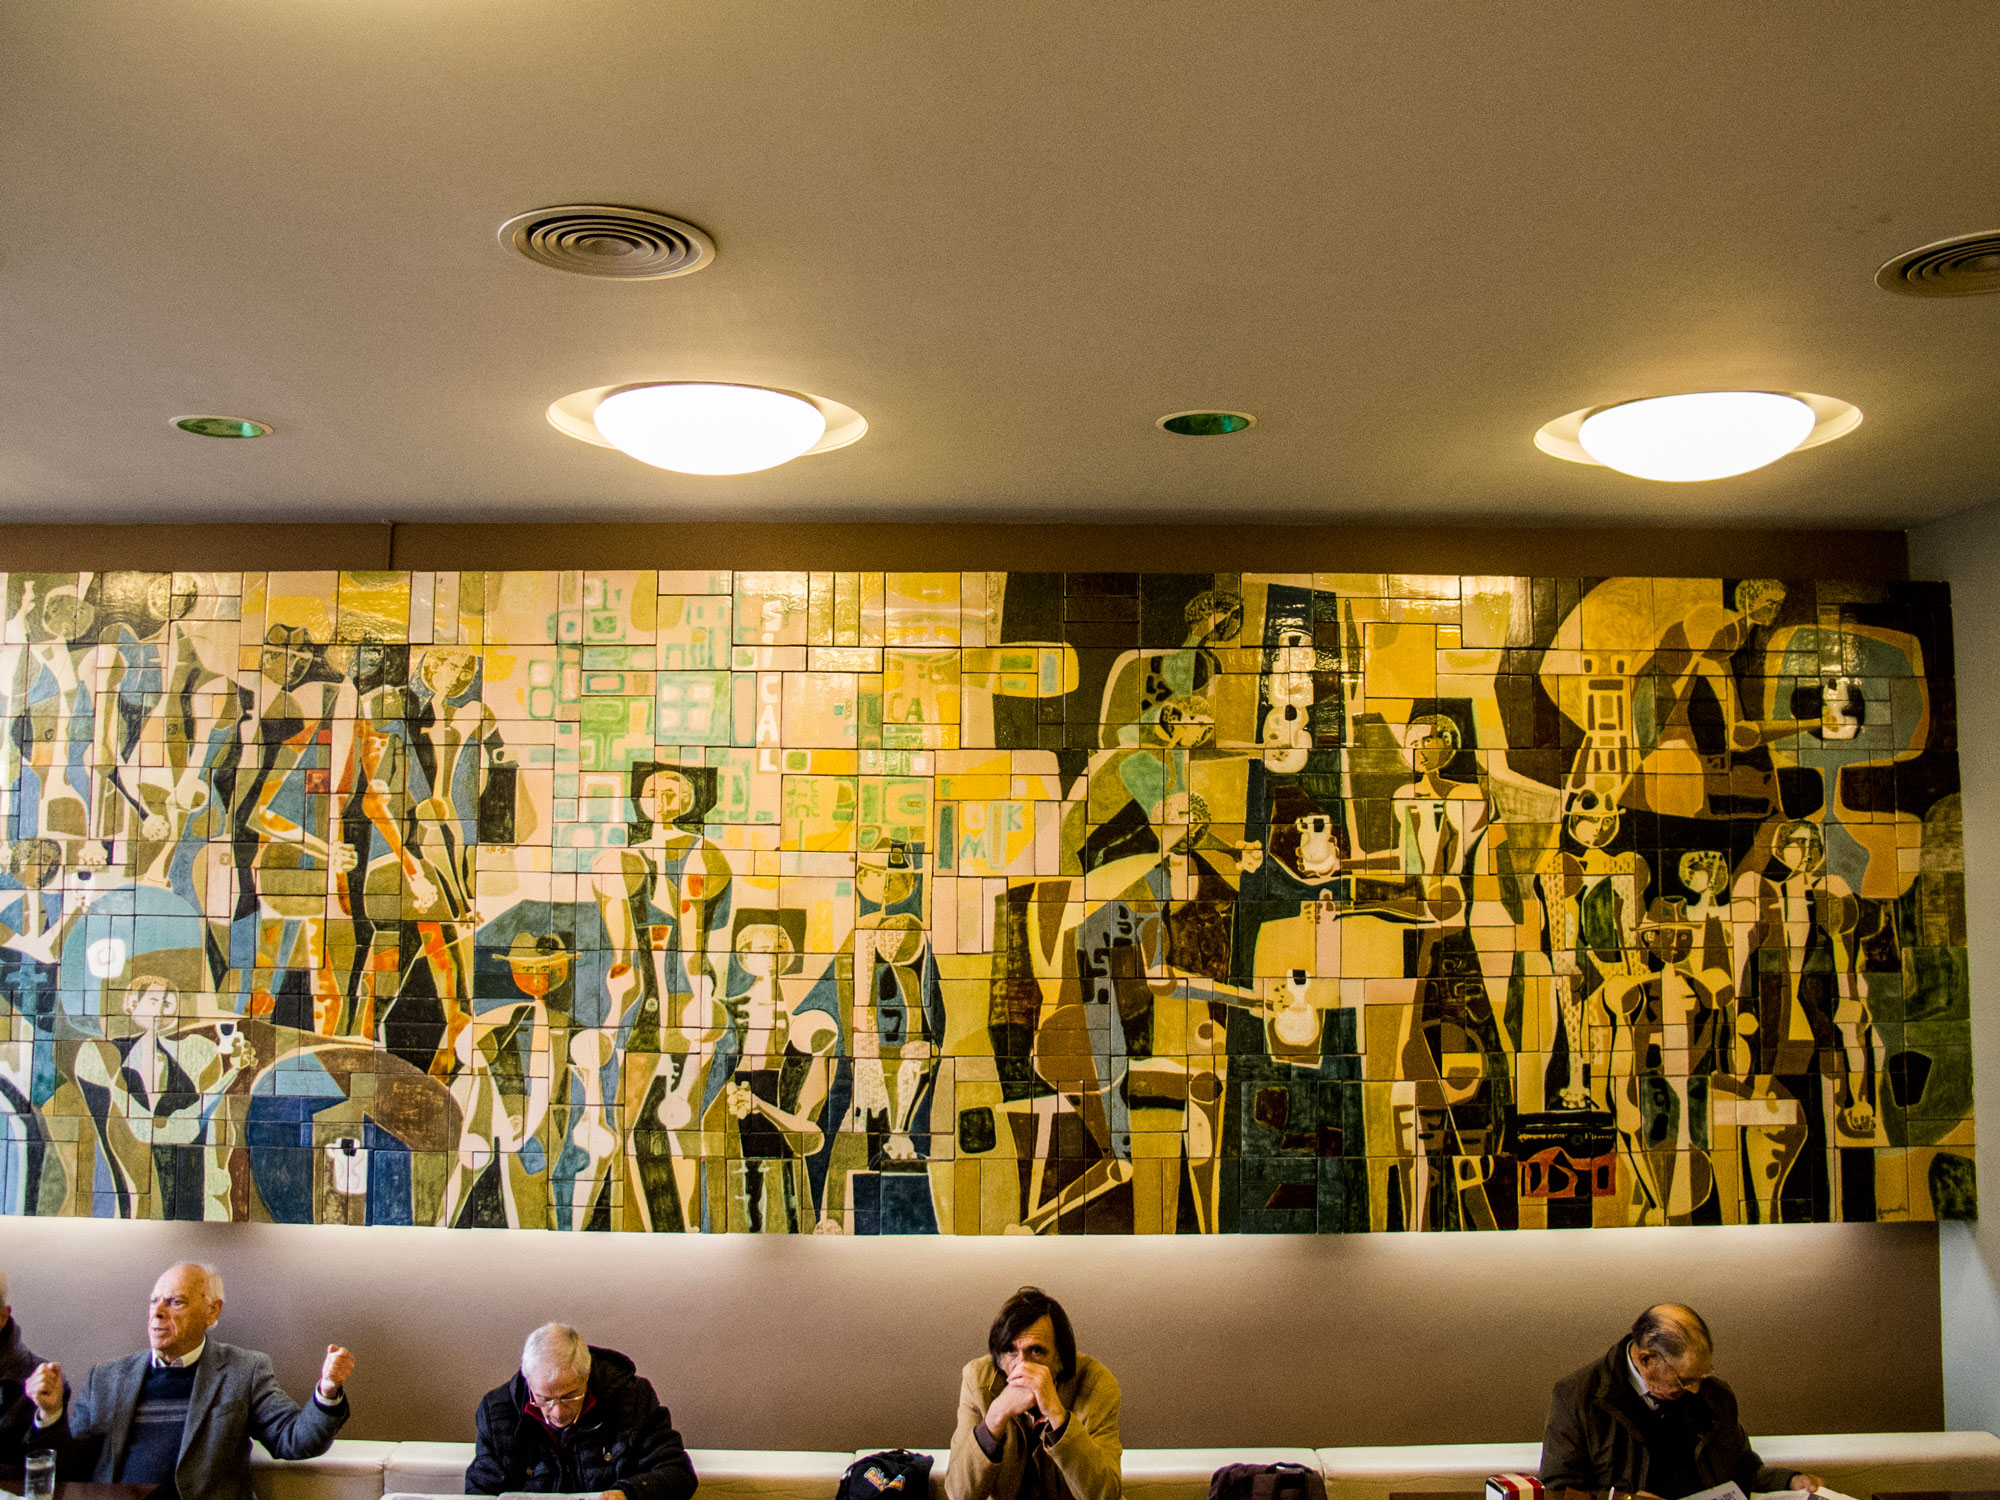 Starbucks in Porto, threat or opportunity?